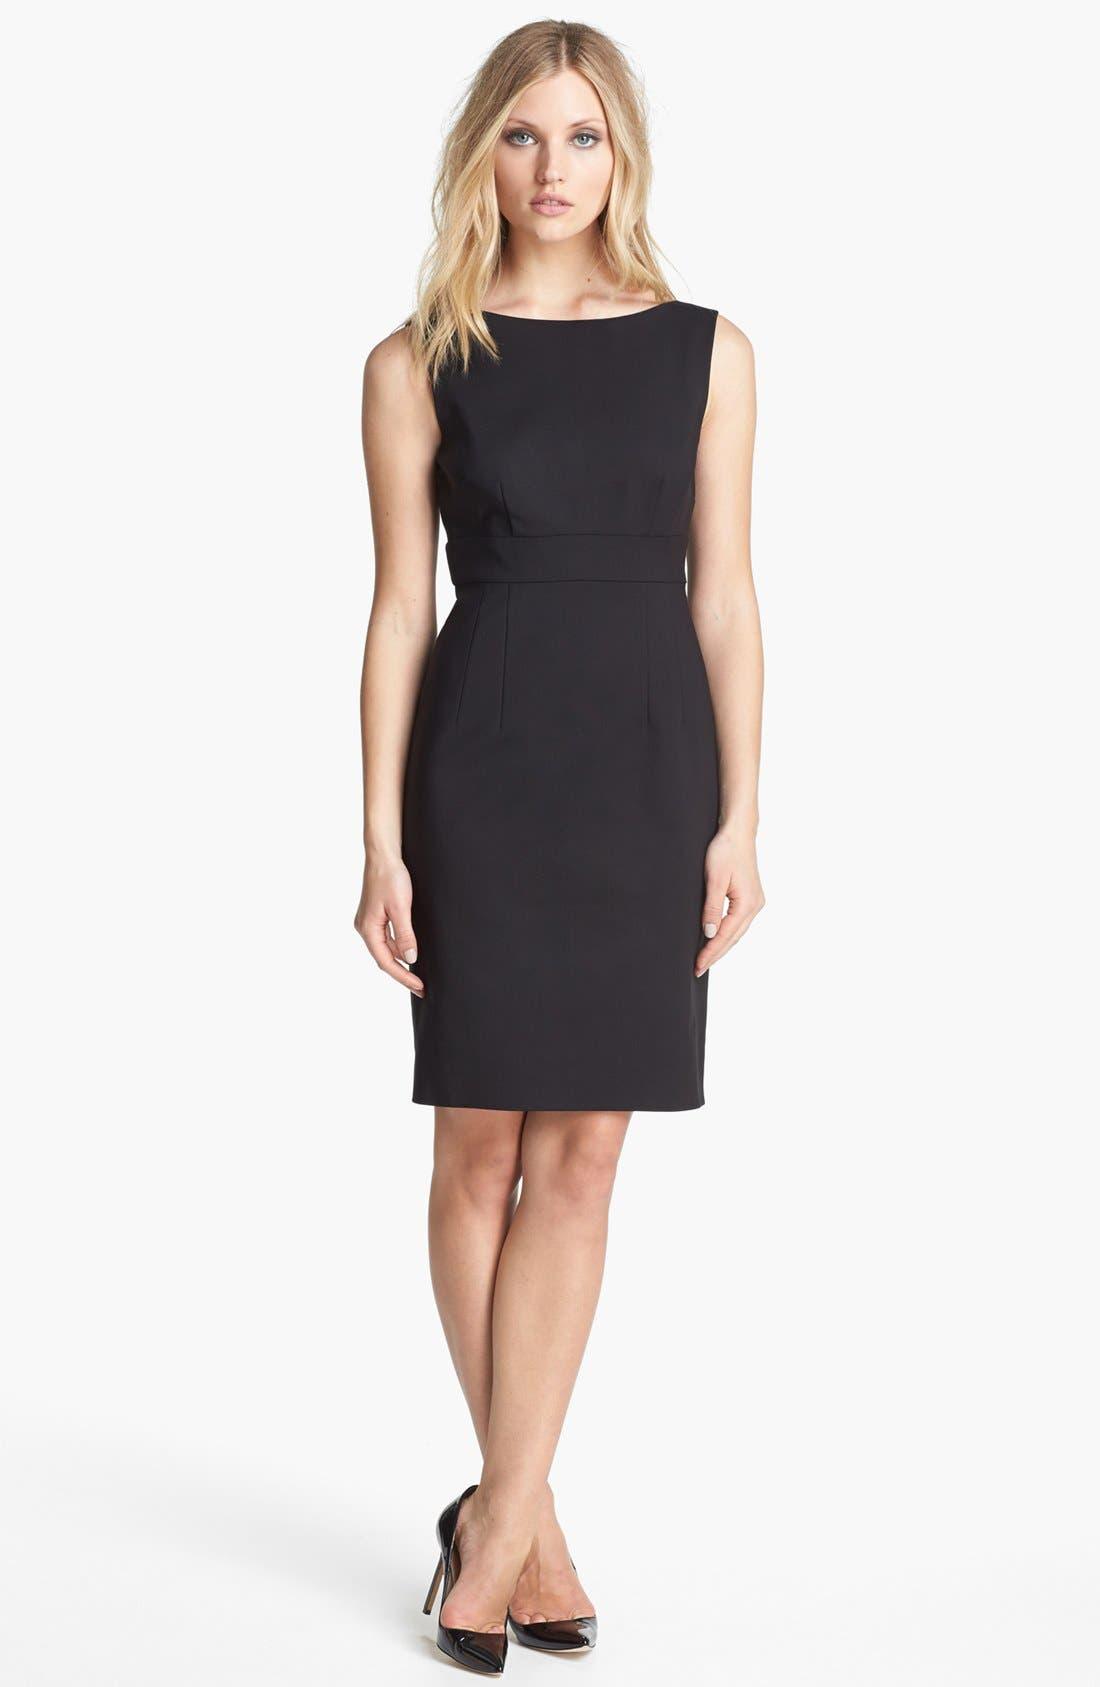 KATE SPADE NEW YORK,                             'joyann' sleeveless dress,                             Main thumbnail 1, color,                             001